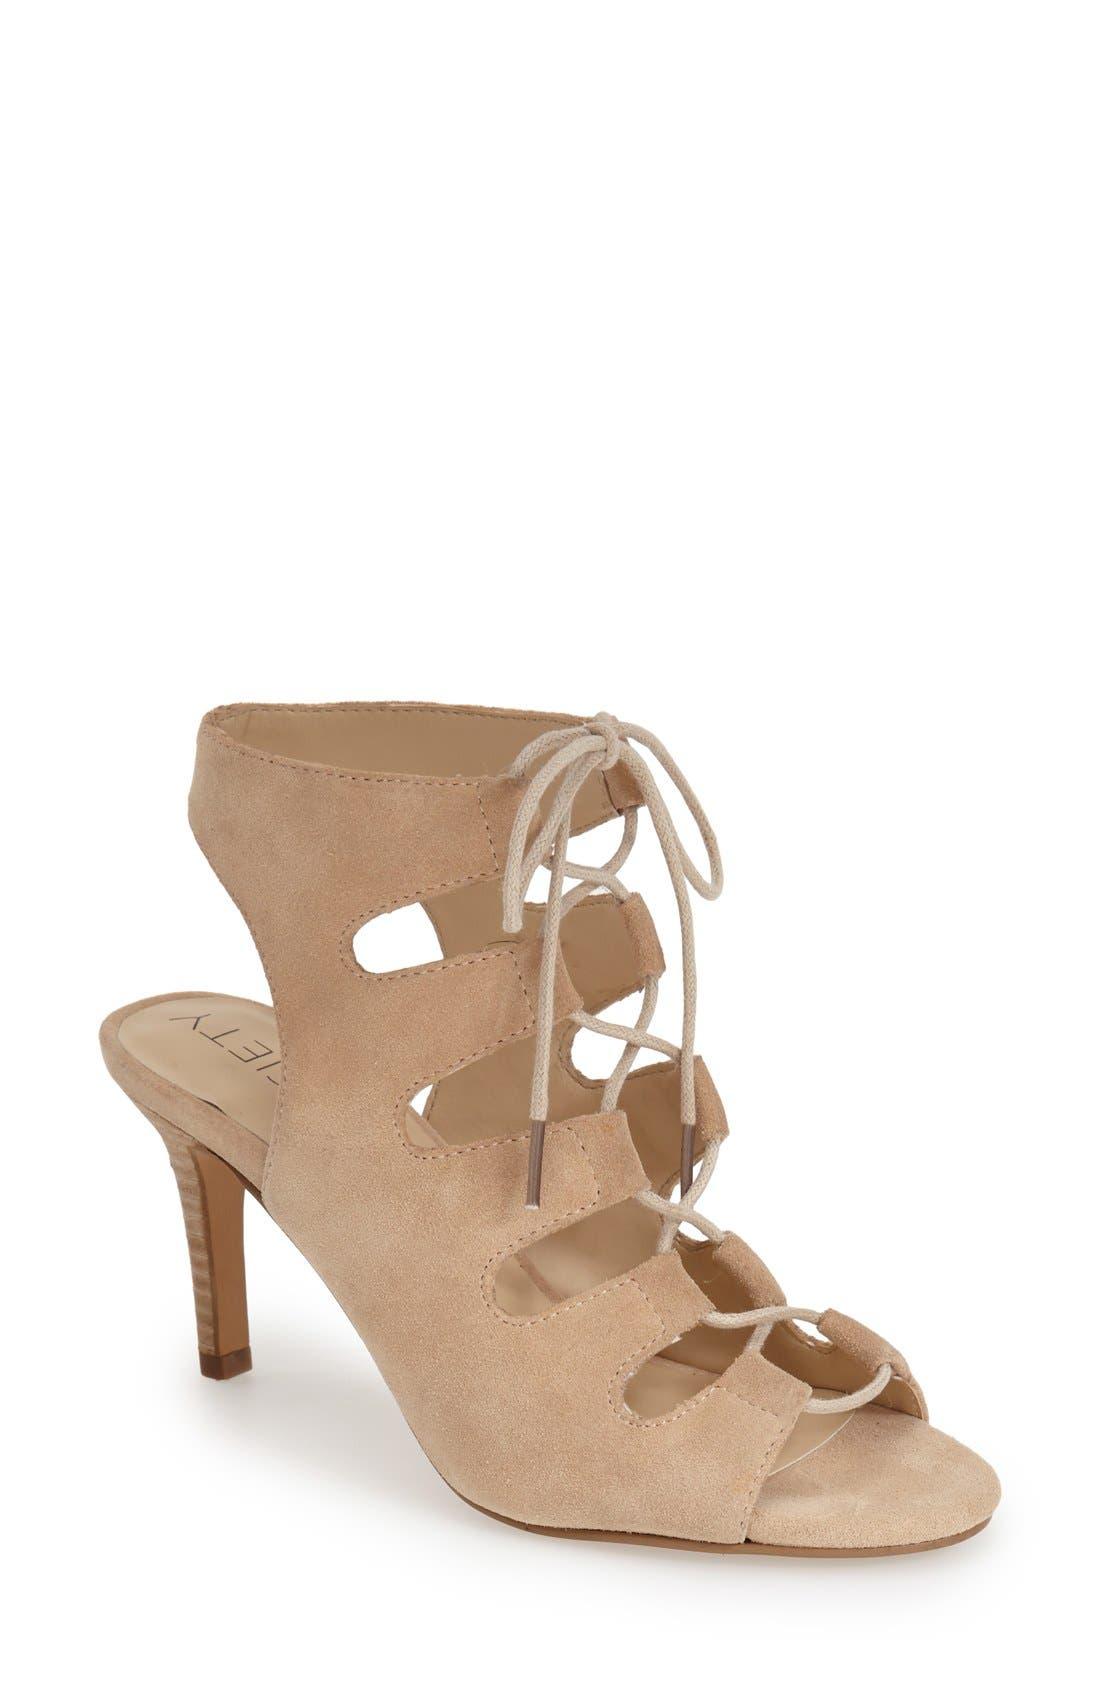 Alternate Image 1 Selected - Sole Society 'Rosalie' Cutout Sandal (Women)